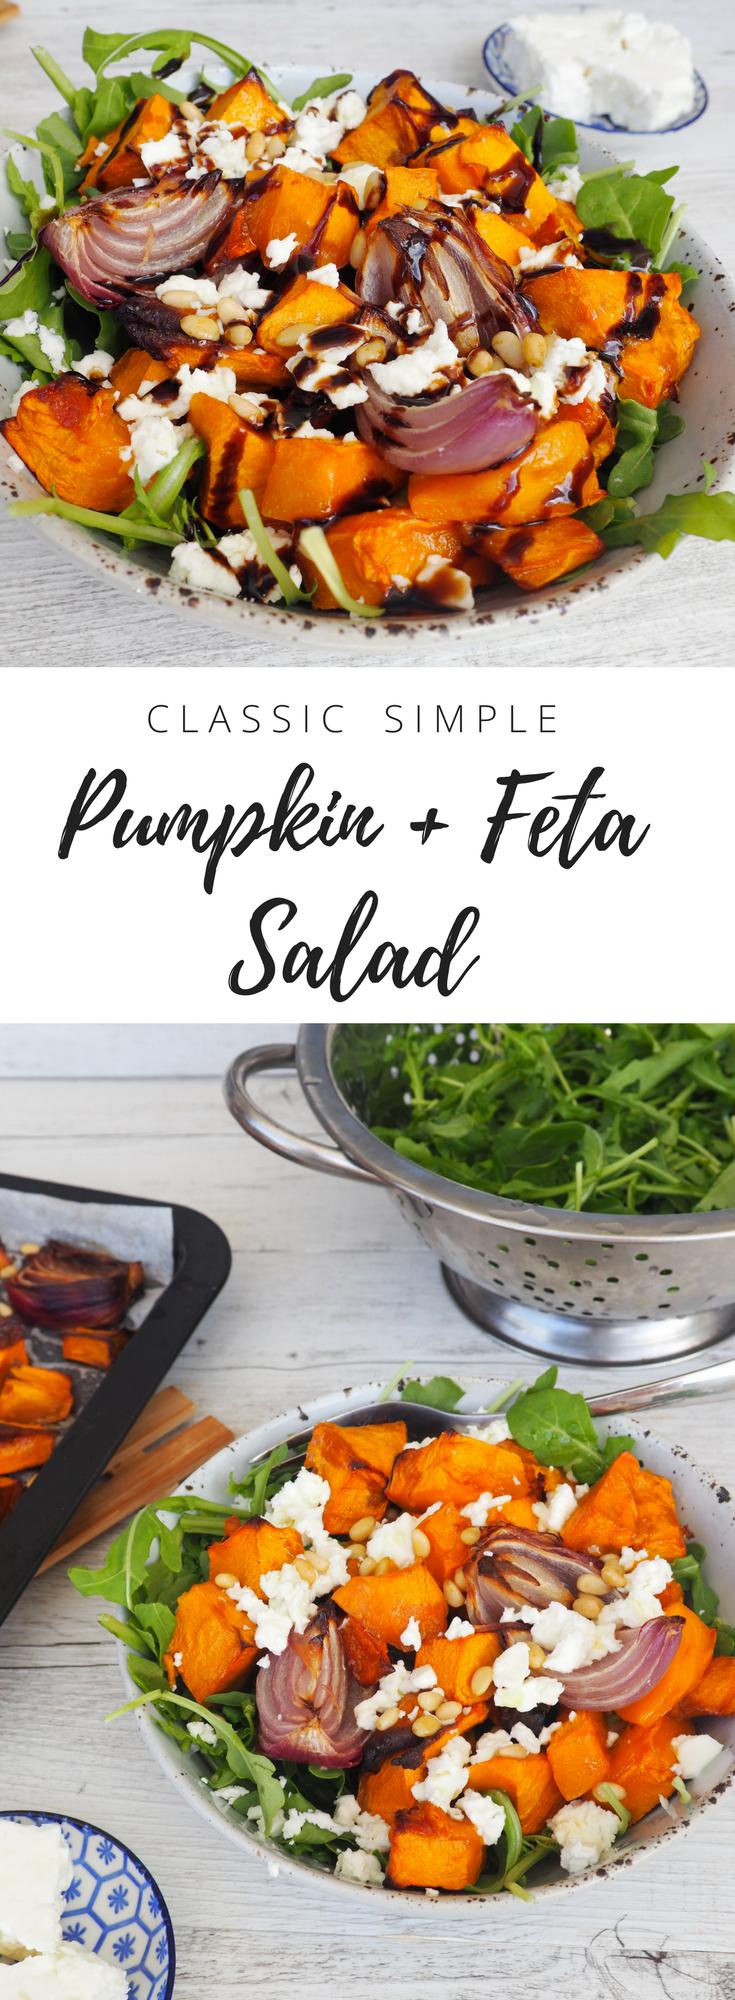 Classic Pumpkin and Feta salad recipe by Lyndi Cohen